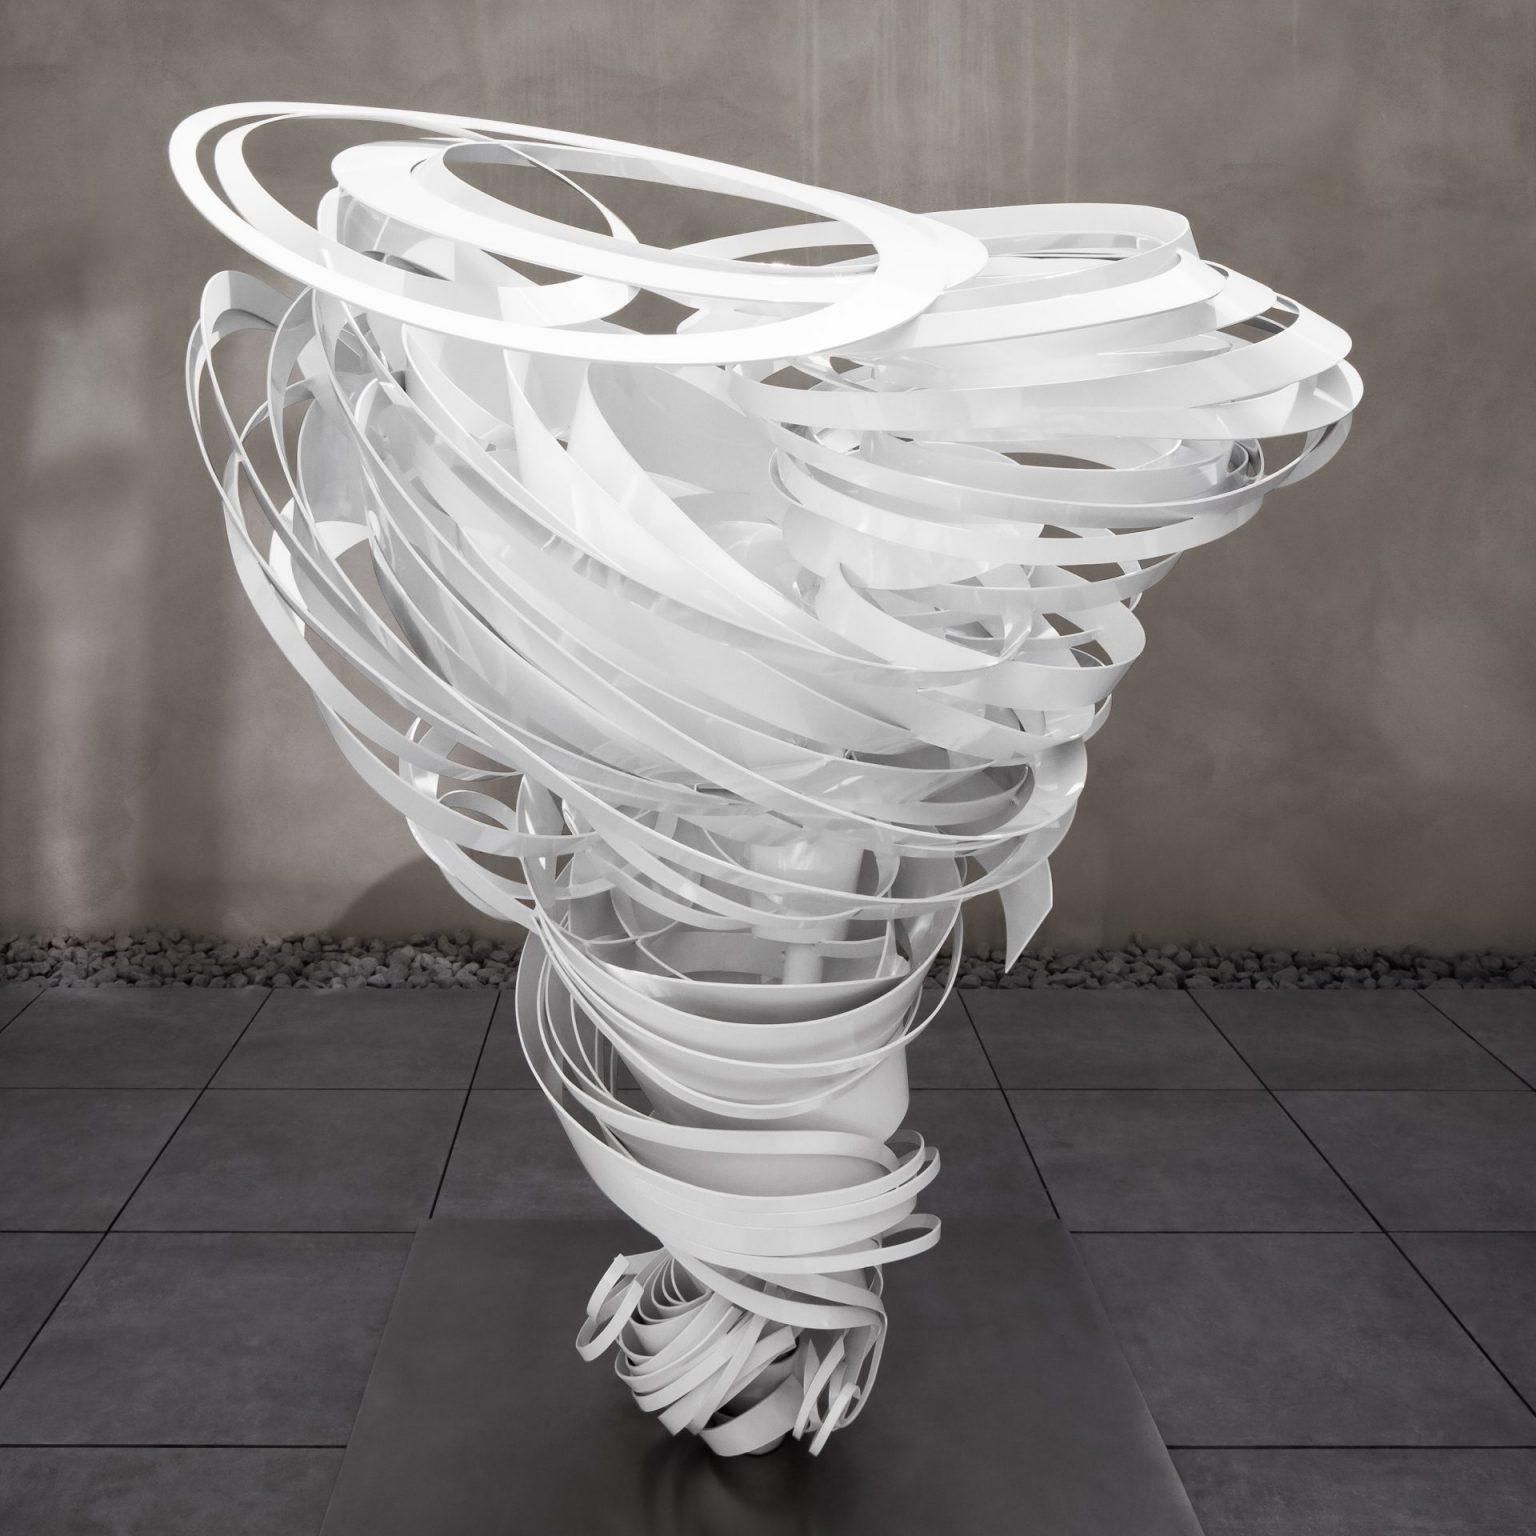 cropped-01AliceAycock_AlienTwister_GalerieThomasSchulte-scaled-1-1536x1536.jpg